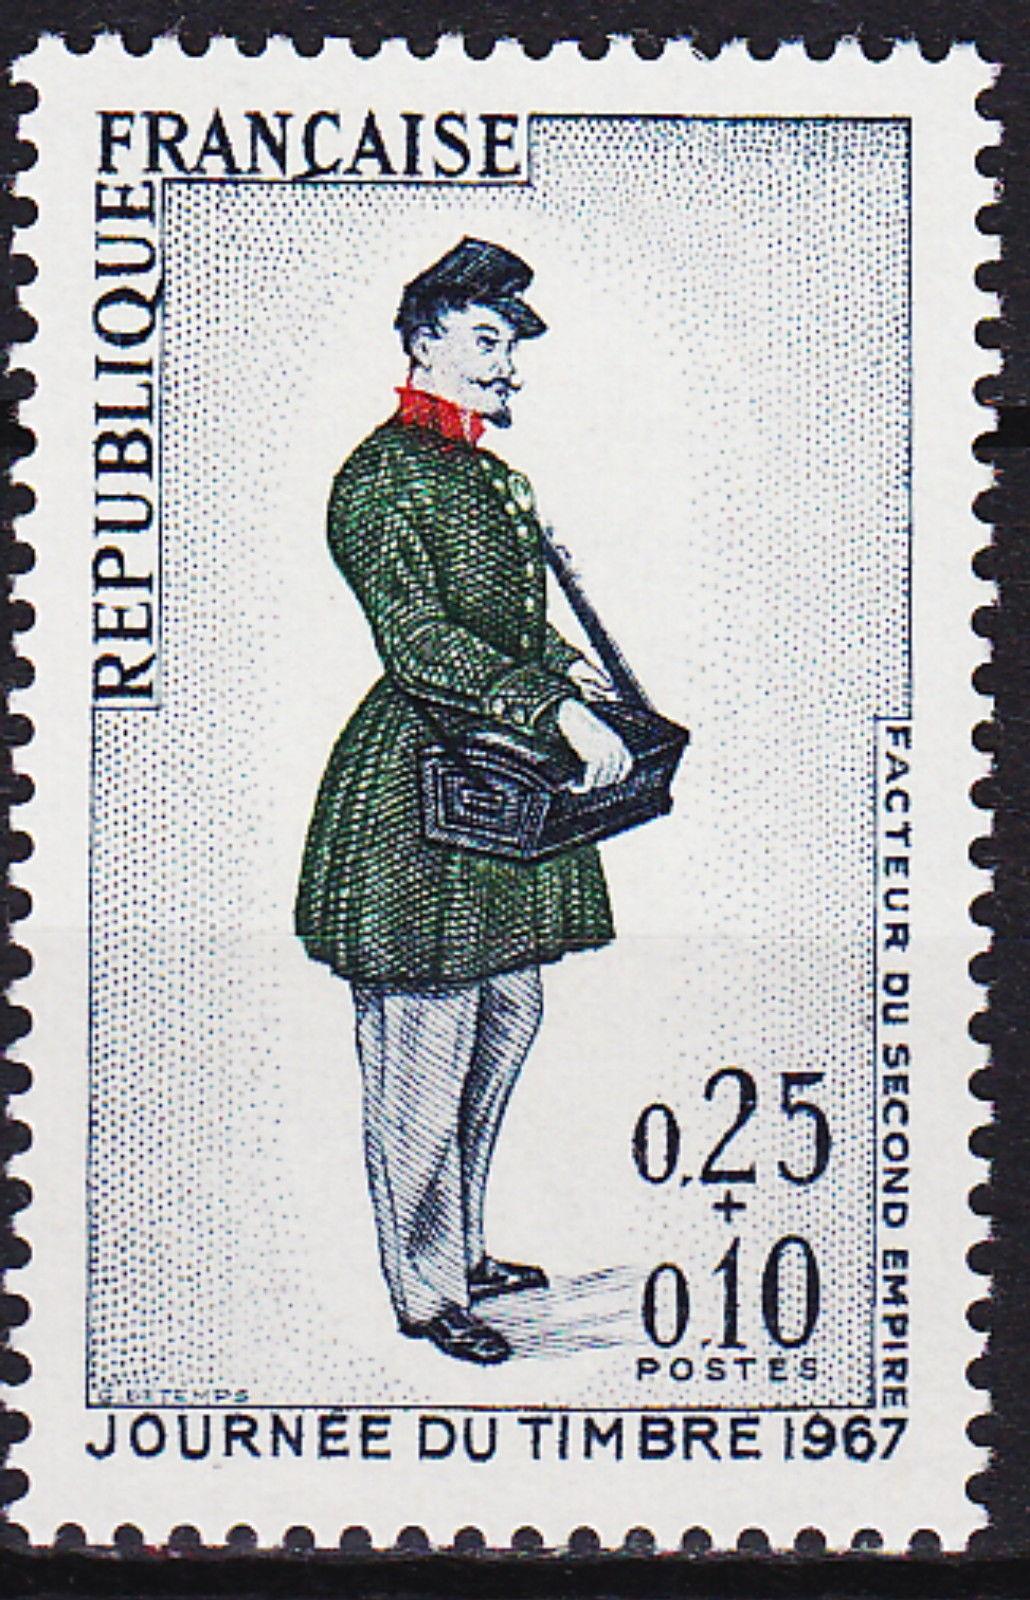 France 1967 Stamp Day